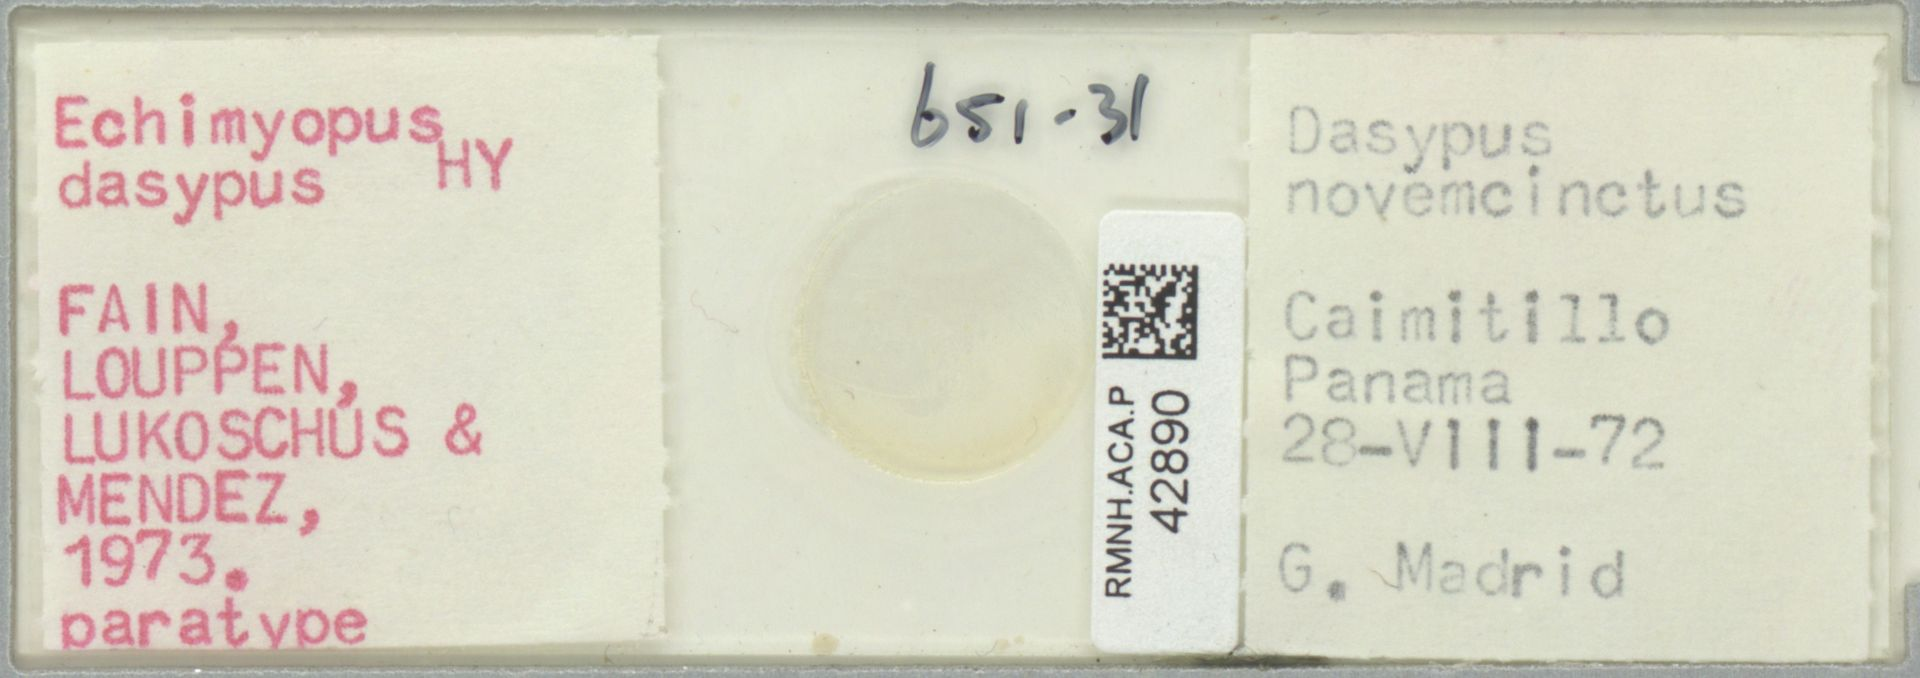 RMNH.ACA.P.42890 | Echimyopus dasypus Fain, Louppen, Lukoschus & Mendez 1973